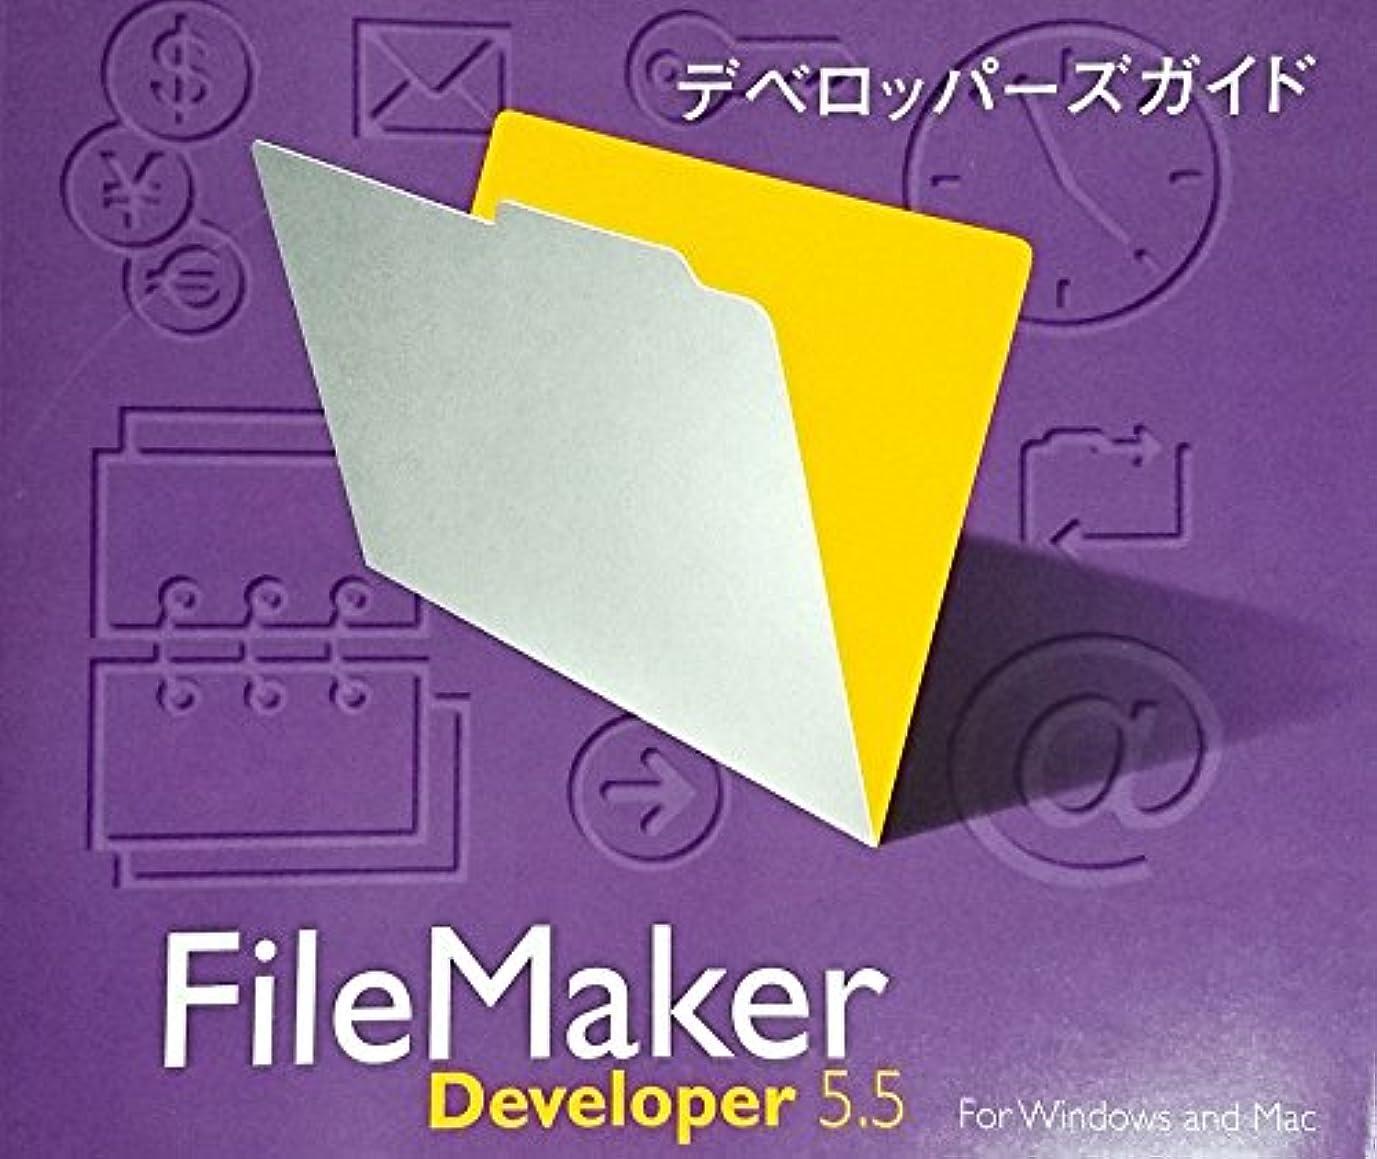 FileMaker Developer 5.5 日本語版 アップグレード版 For Macintosh